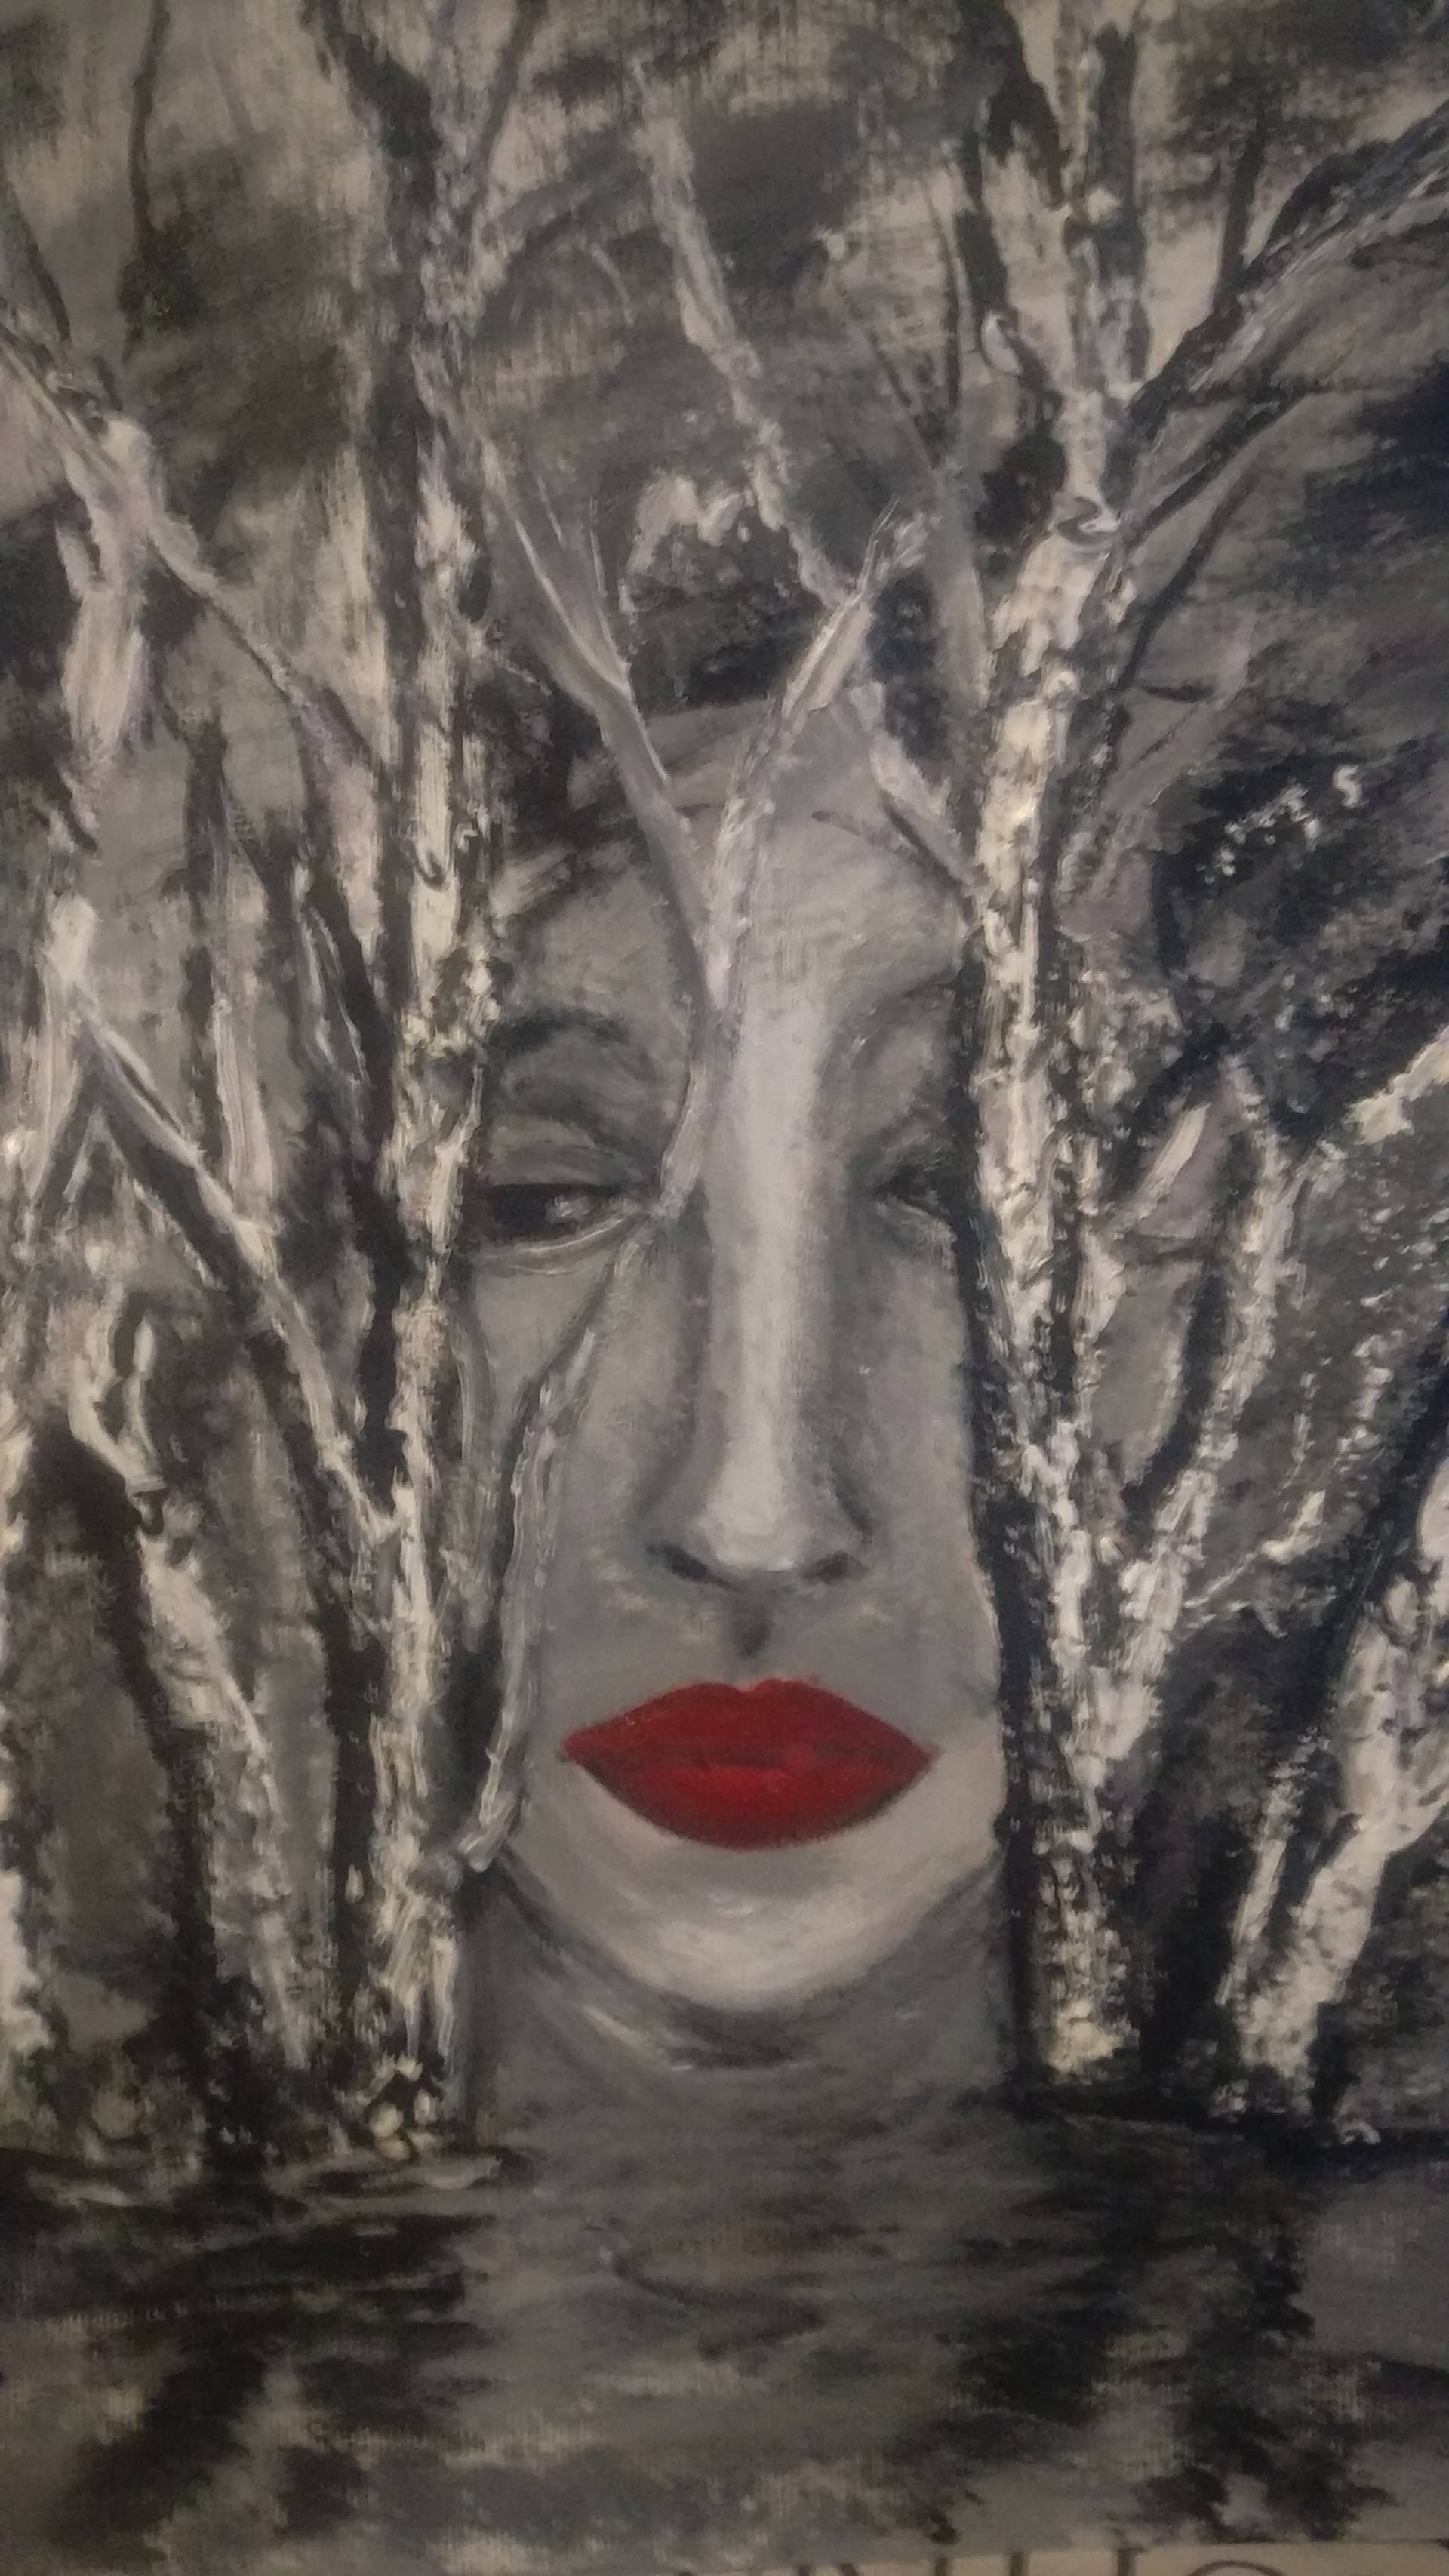 Risultati immagini per depression mother saatchi art